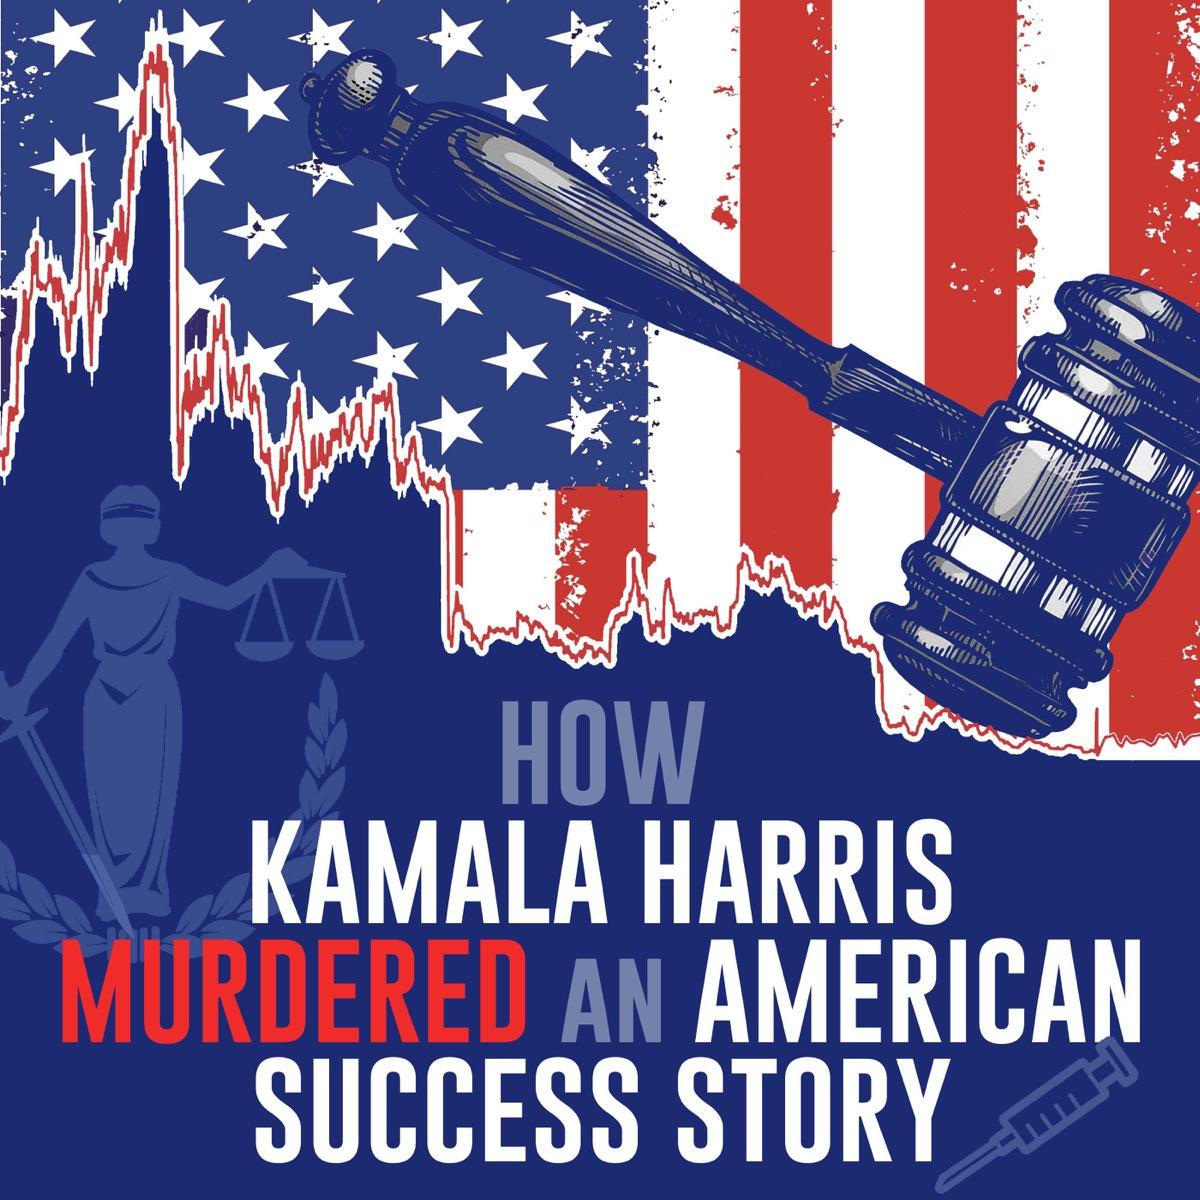 How Kamala Harris Murdered An American Success Story